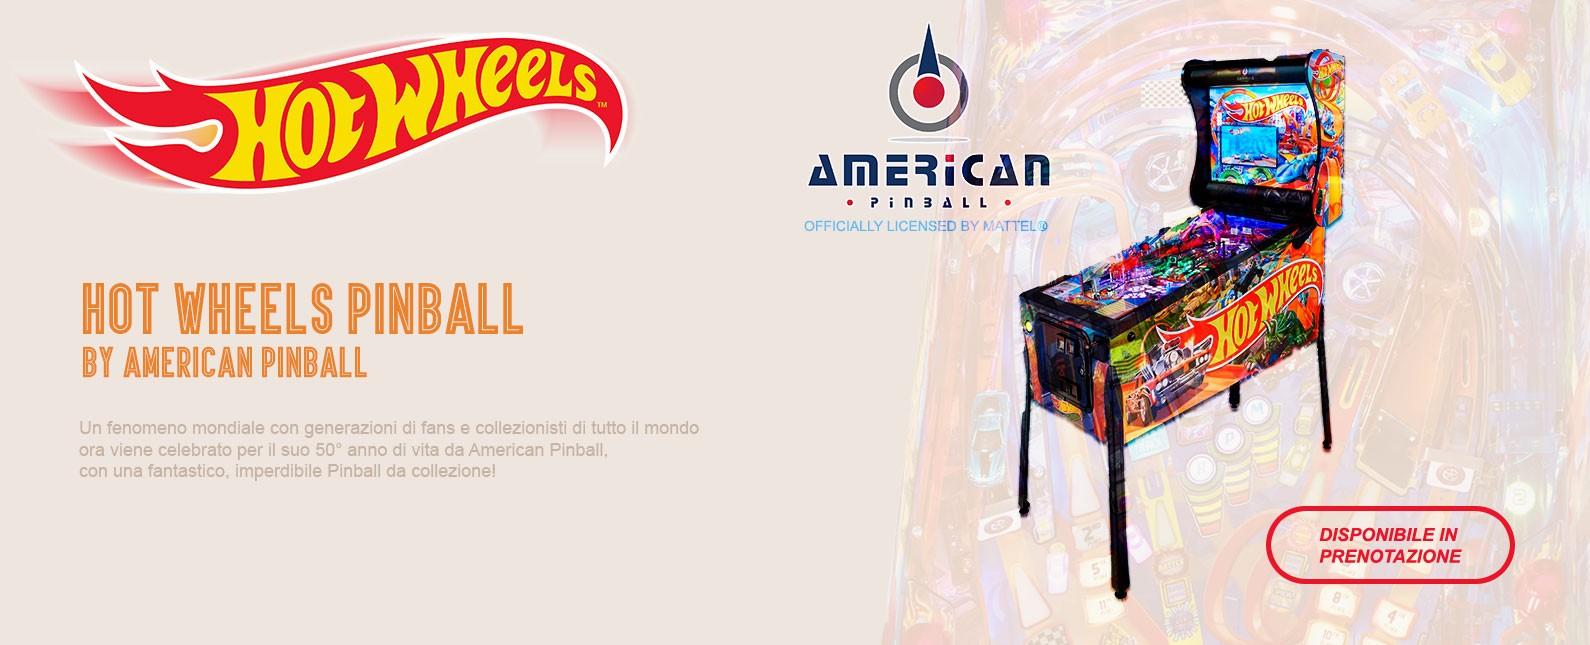 Hot Wheels Pinball